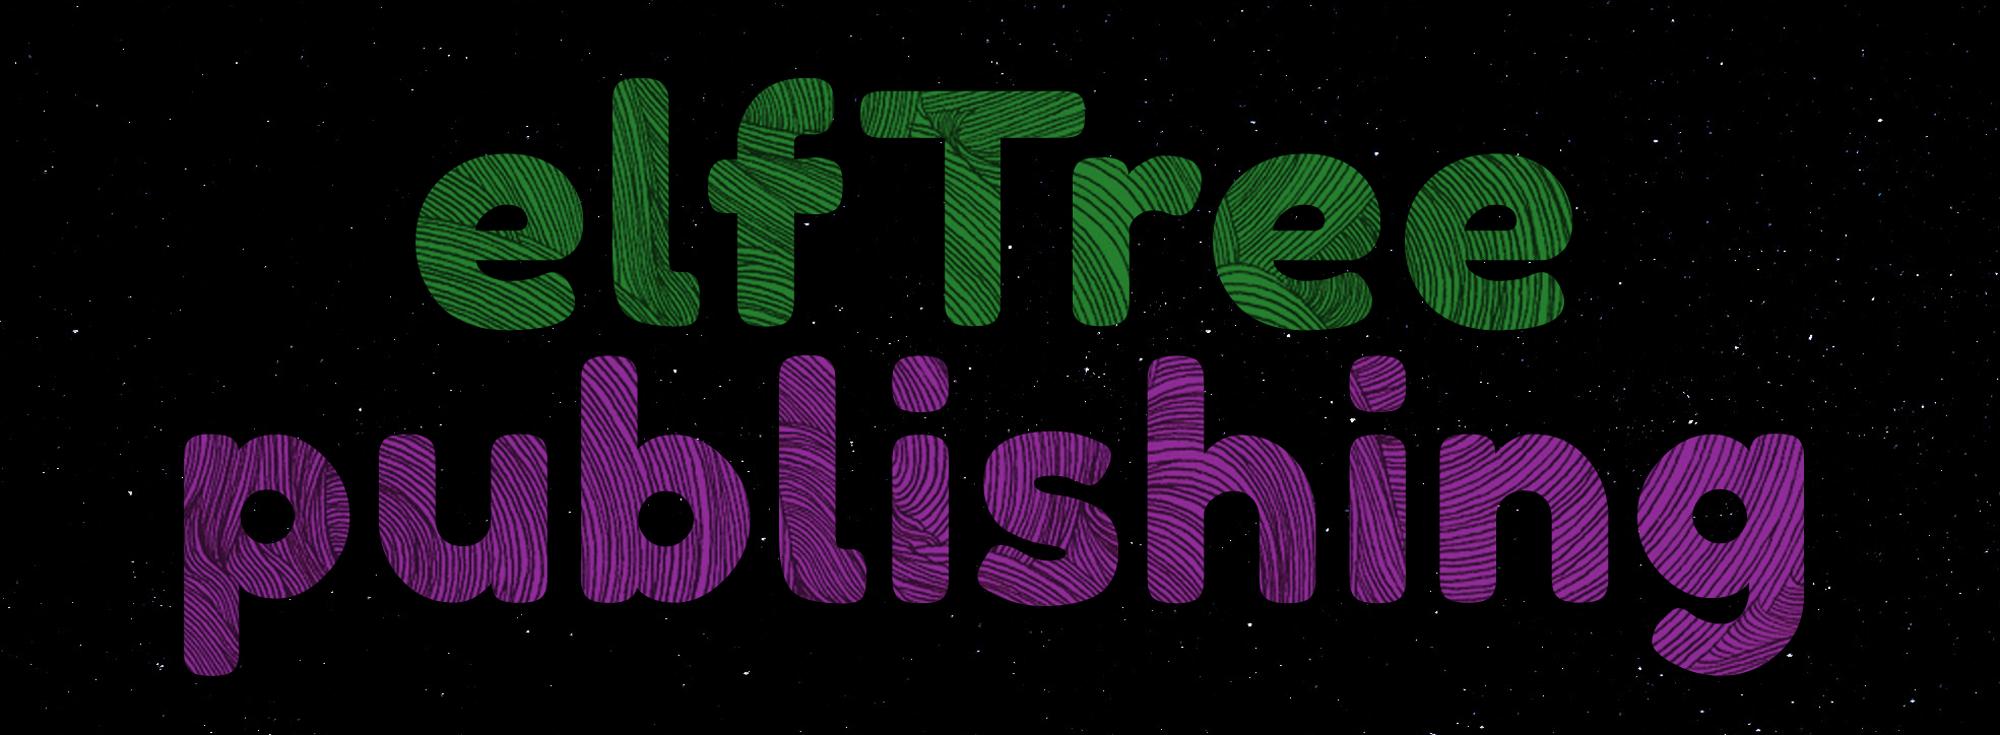 elfTreepublishing_logo.jpg